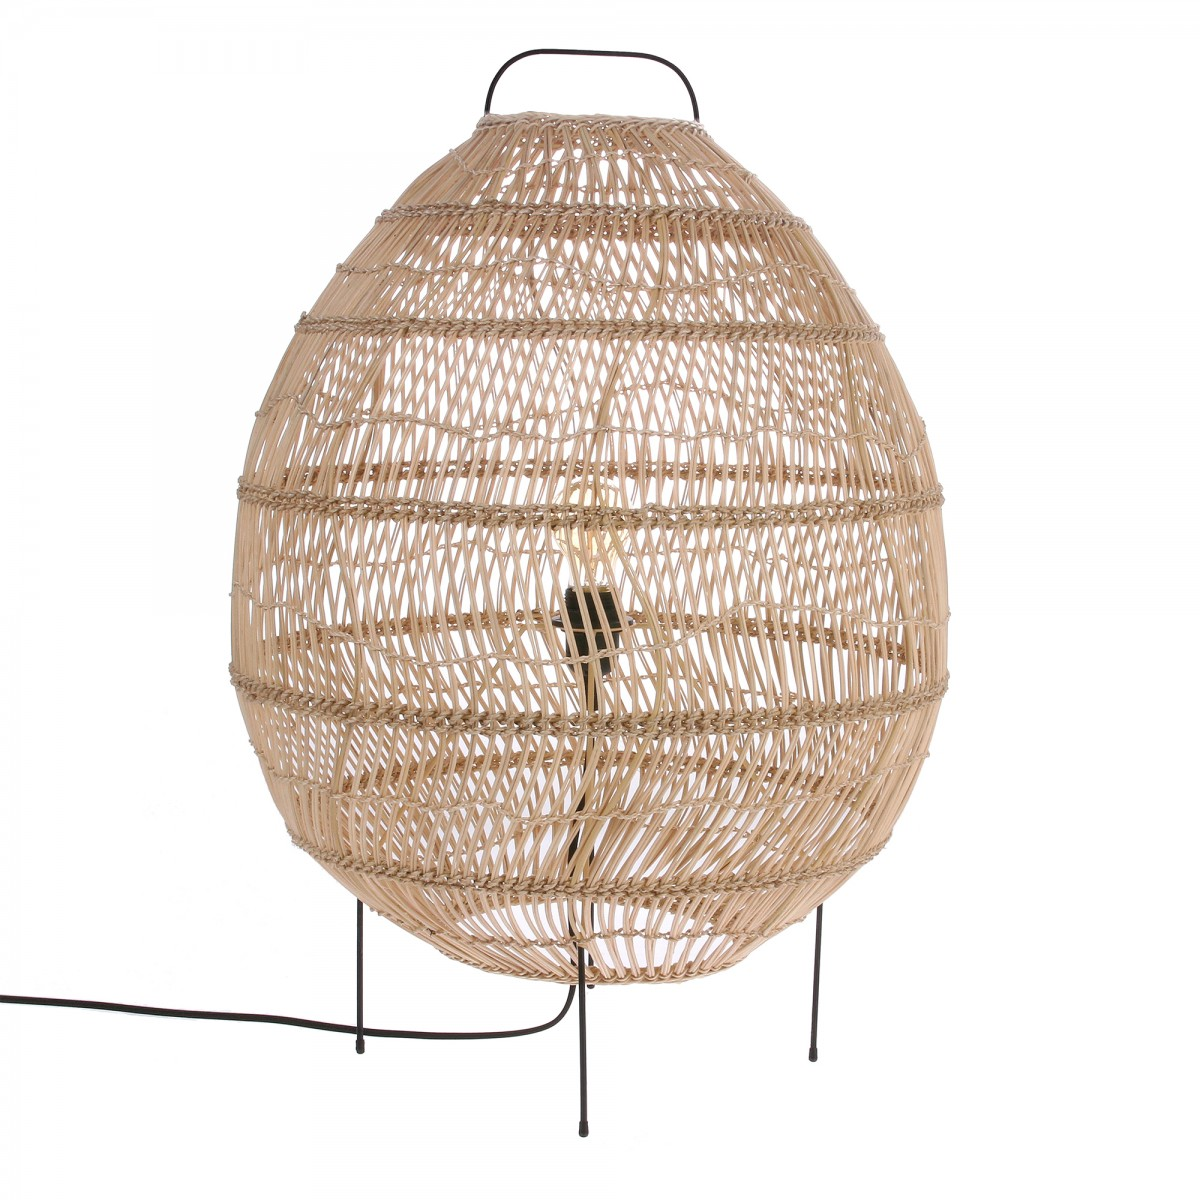 Bamboo Oval Table Lamp: WICKER Egg Floor Lamp